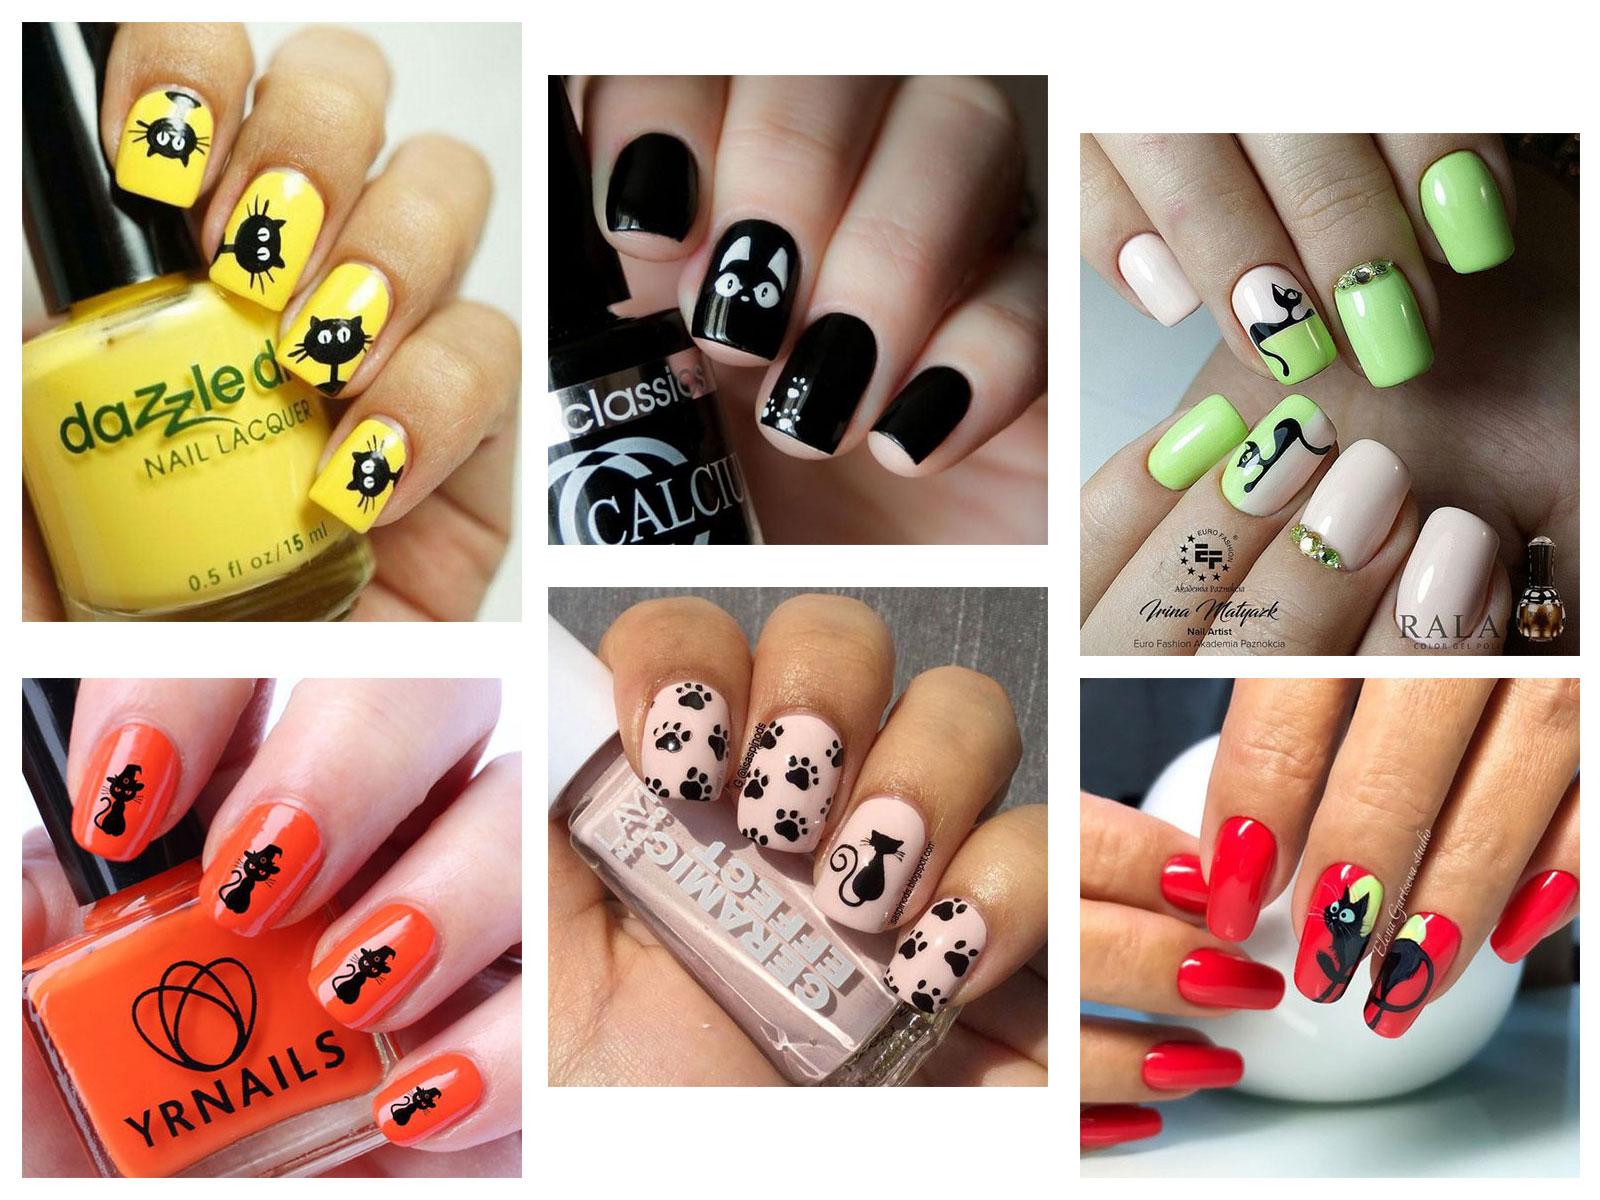 20-Spooky-Halloween-Black-Cat-Nails-Art-Designs-Ideas-2019-F